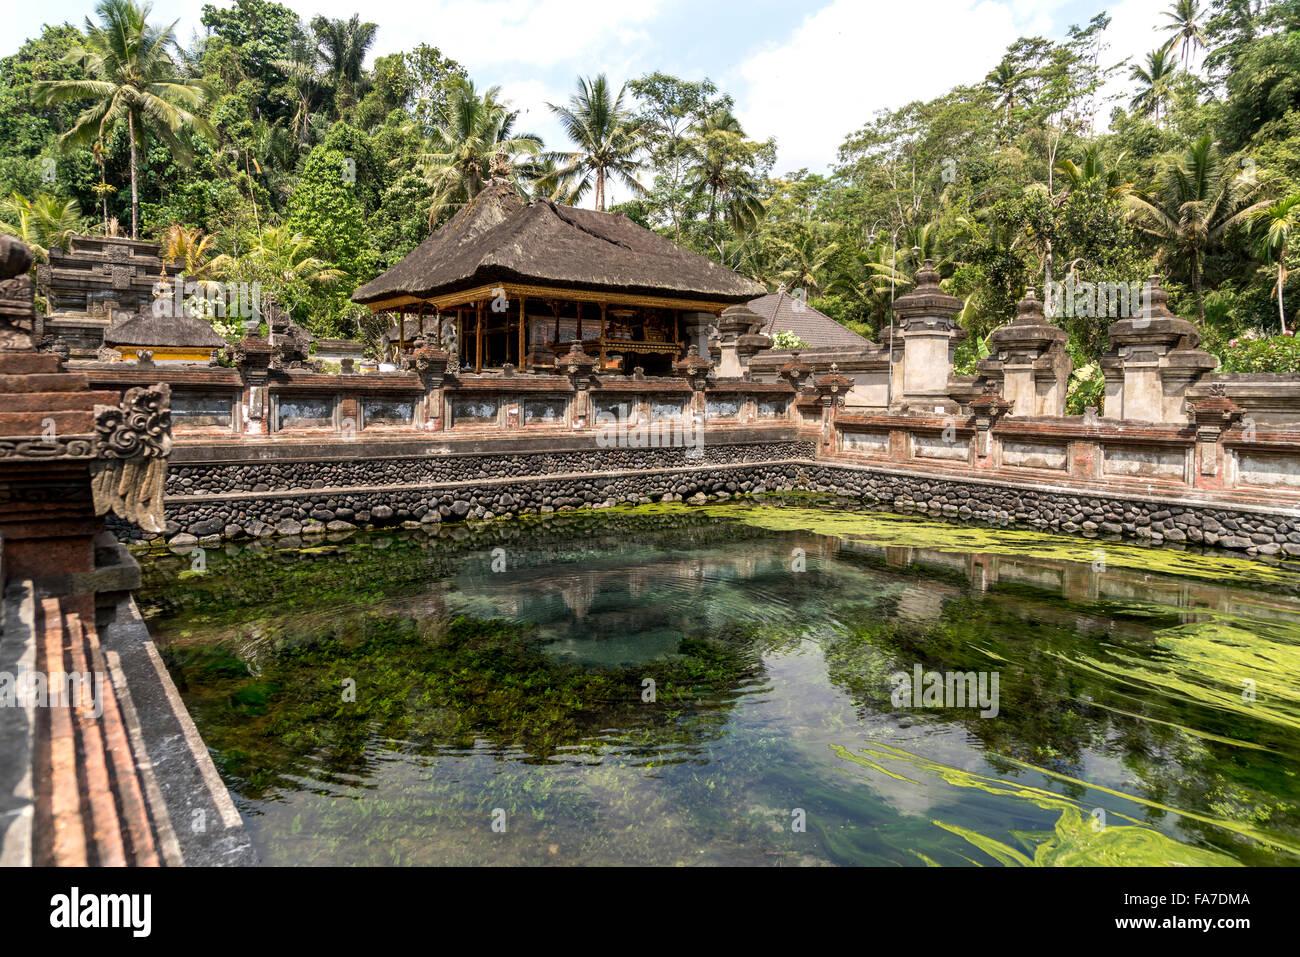 Muelle del santo templo del agua Tirta Empul hindú cerca de Ubud, Bali, Indonesia Imagen De Stock